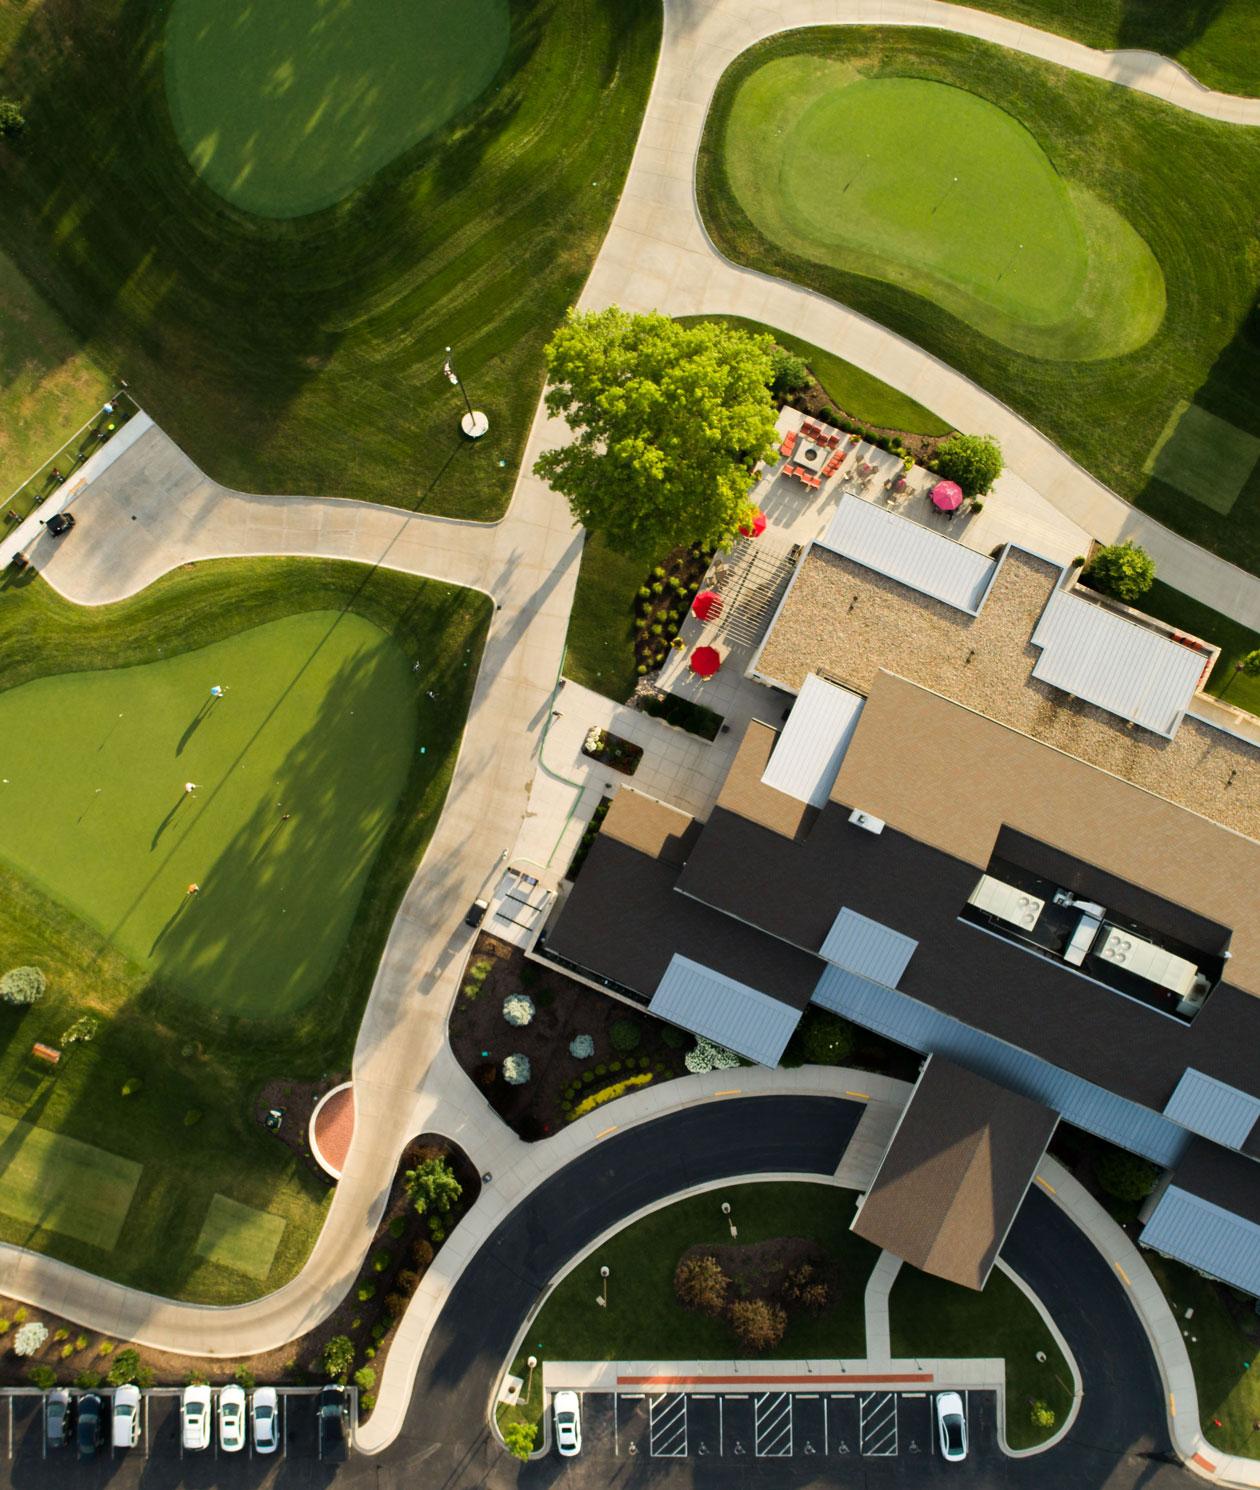 Milburn Country Club - Private Country Club Overland Park, Kansas